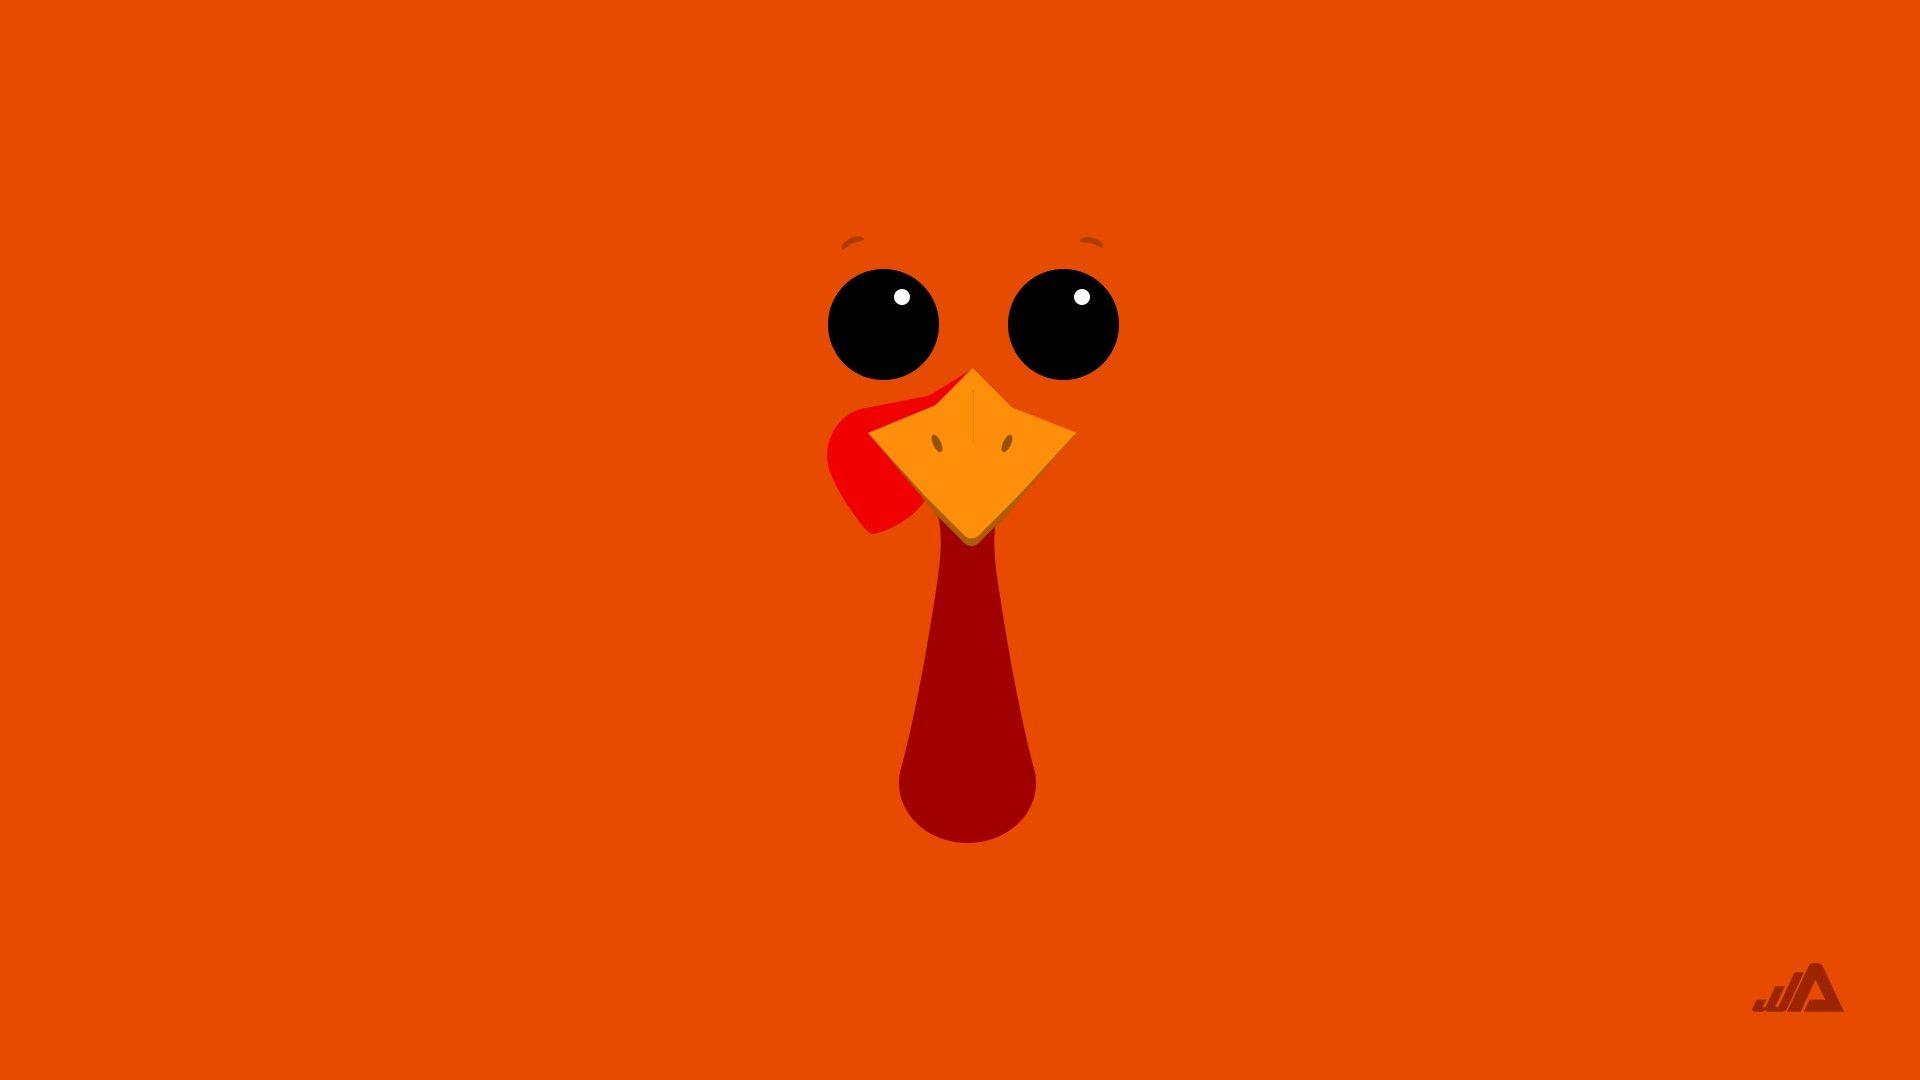 Thanksgiving Turkey Wallpapers   Top Thanksgiving Turkey 1920x1080